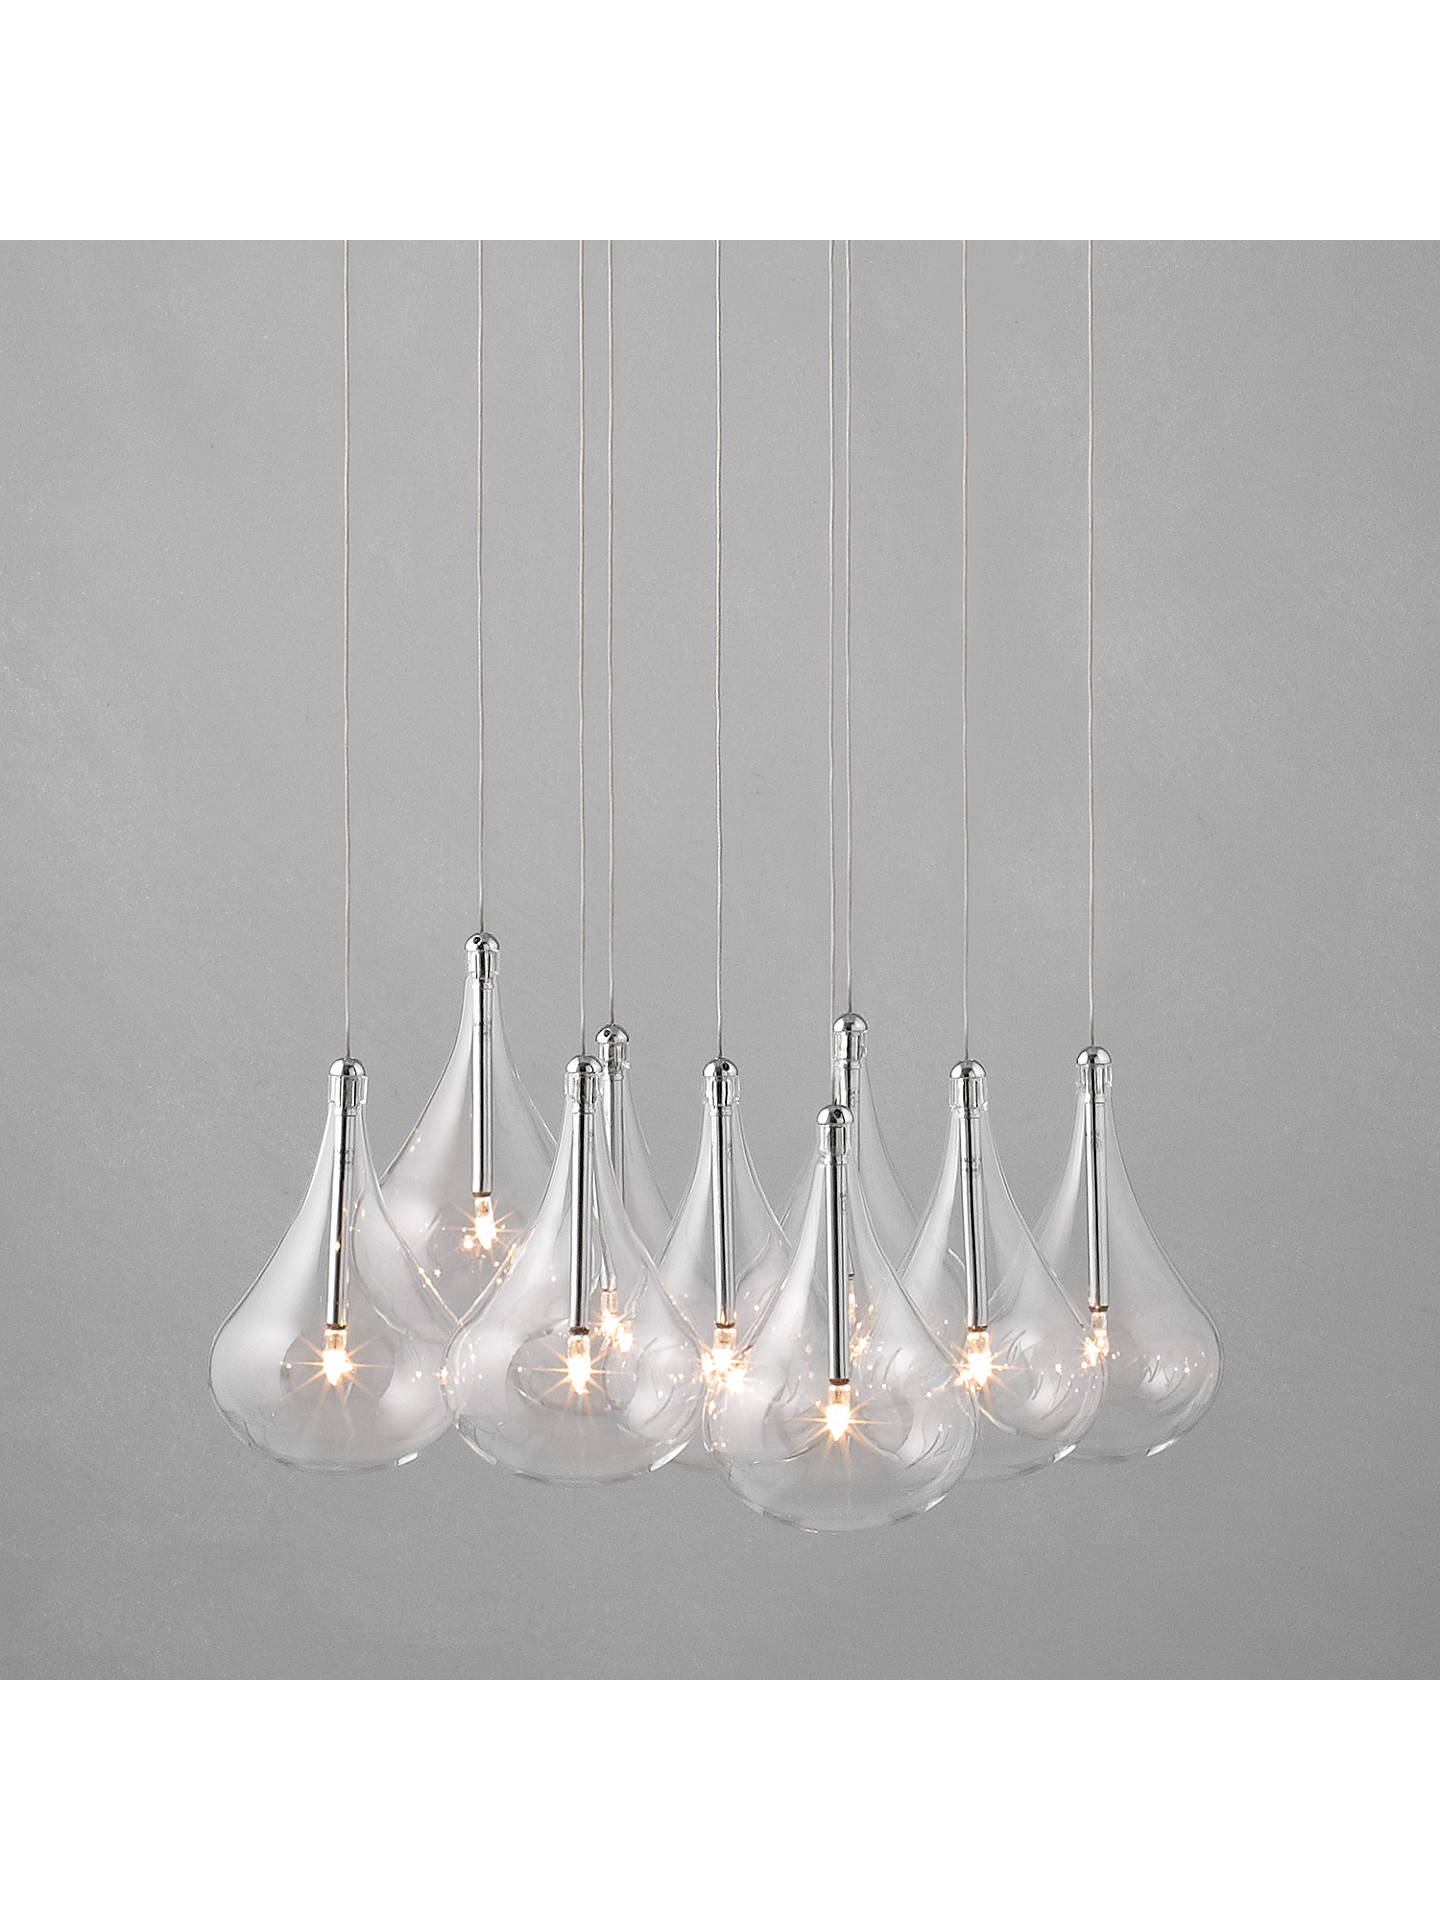 huge discount e1261 2671a John Lewis & Partners Jensen Dangle Cluster Ceiling Lights, x9 Lights